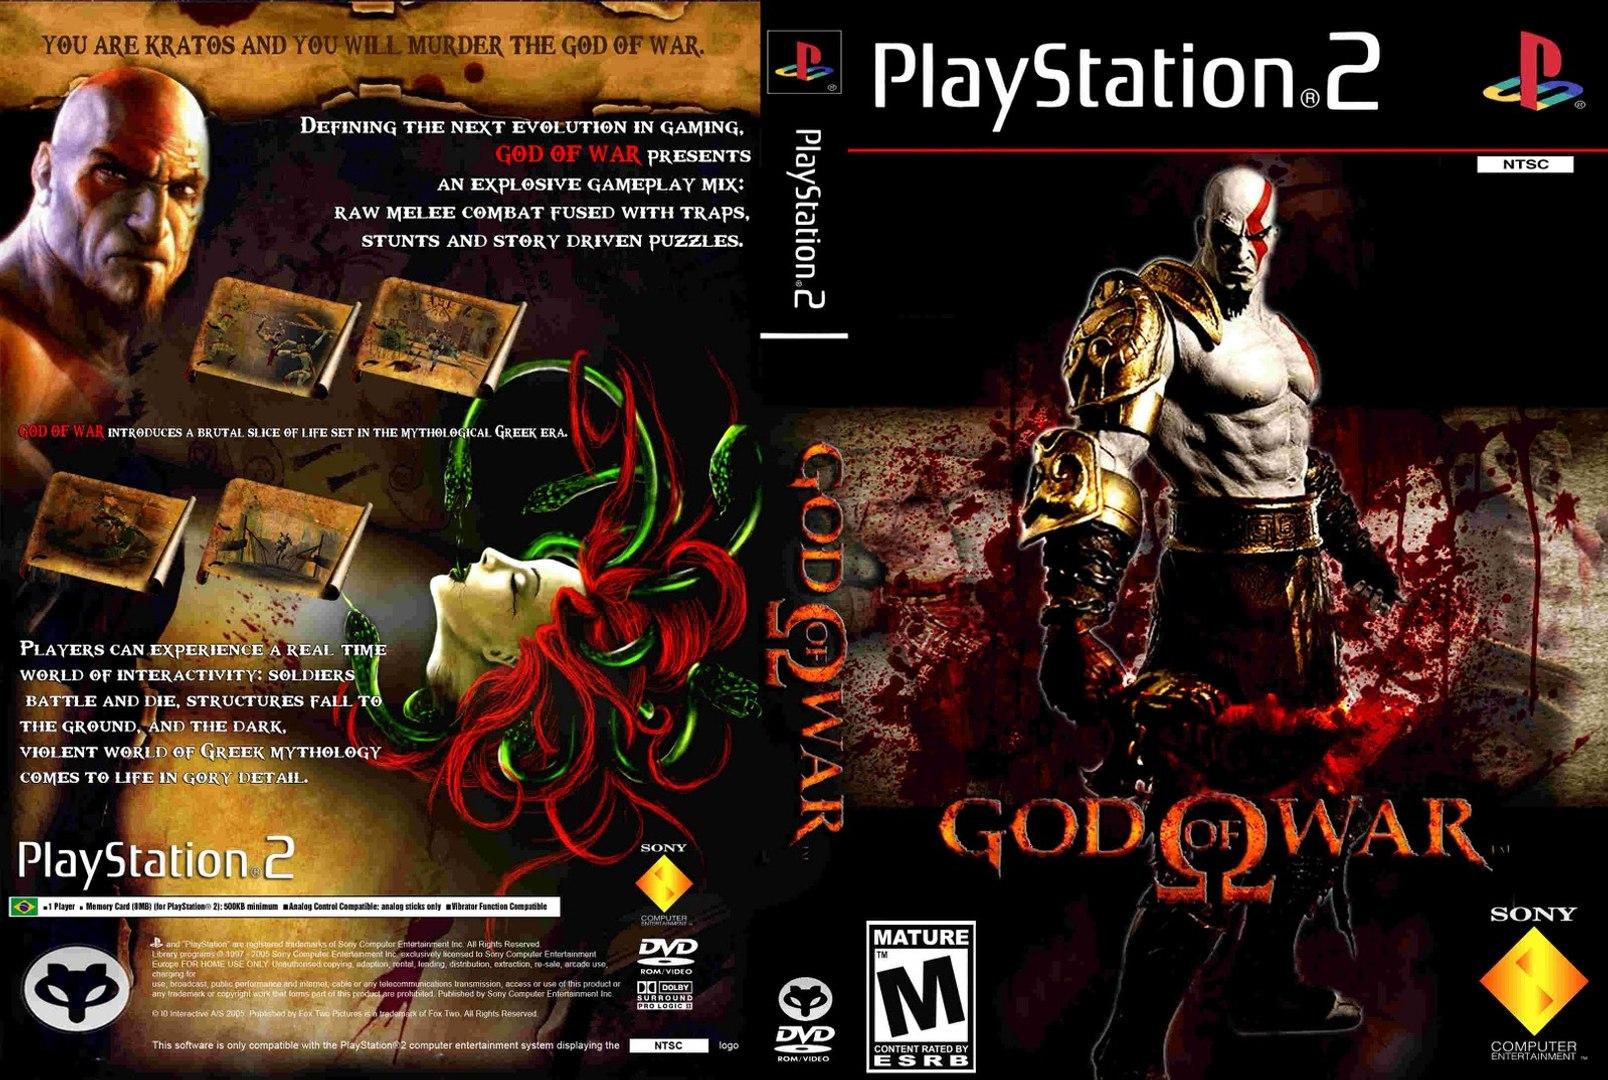 God of War 1 - God Mode (very hard) - #1 Prologue PS2